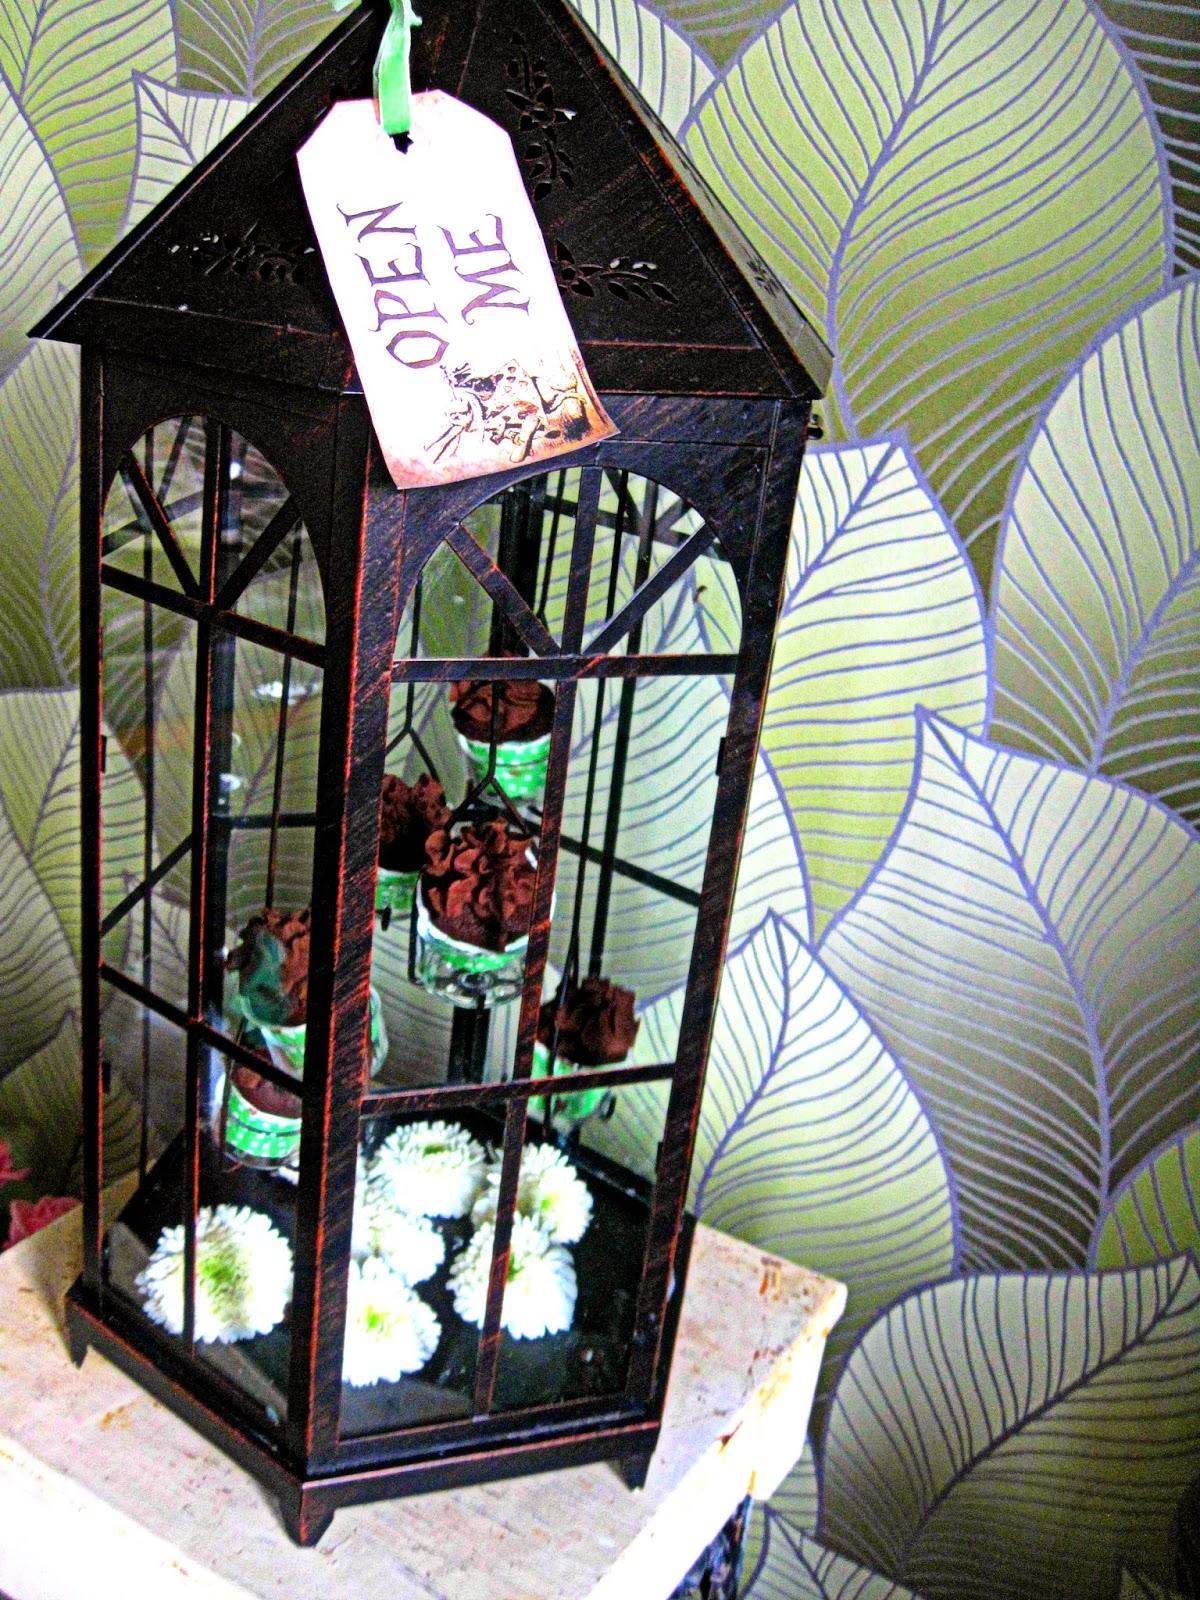 http://cupcakeluvs.blogspot.dk/2014/04/coffe-coco-cupcakes.html